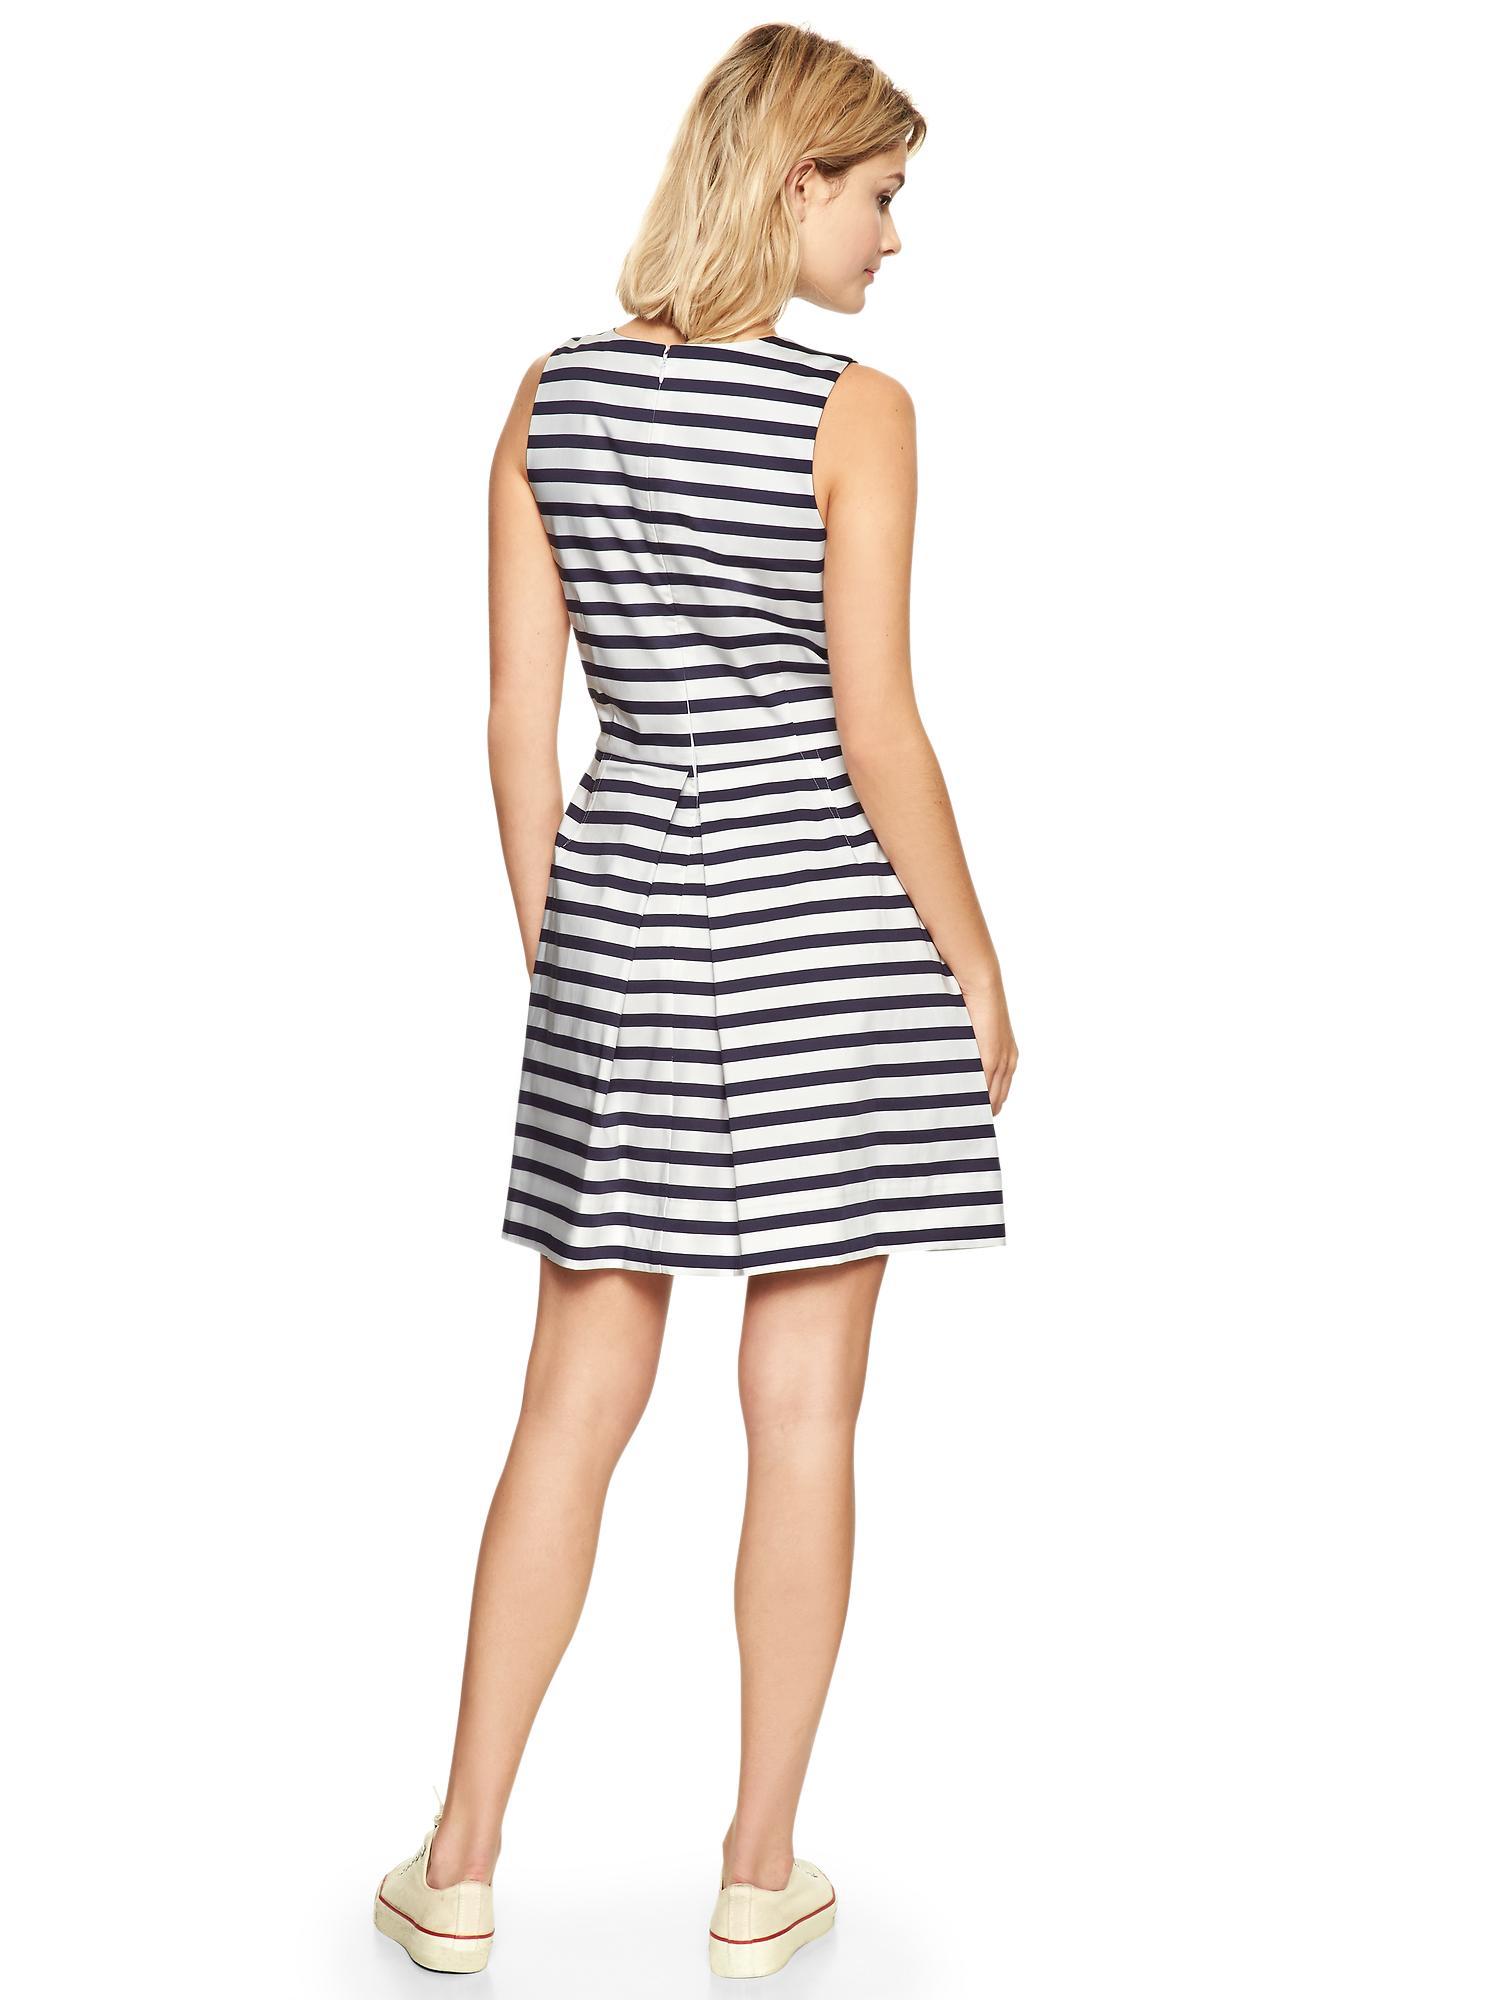 Gap Stripe Sateen Fit Amp Flare Dress In Navy Amp White Stripe